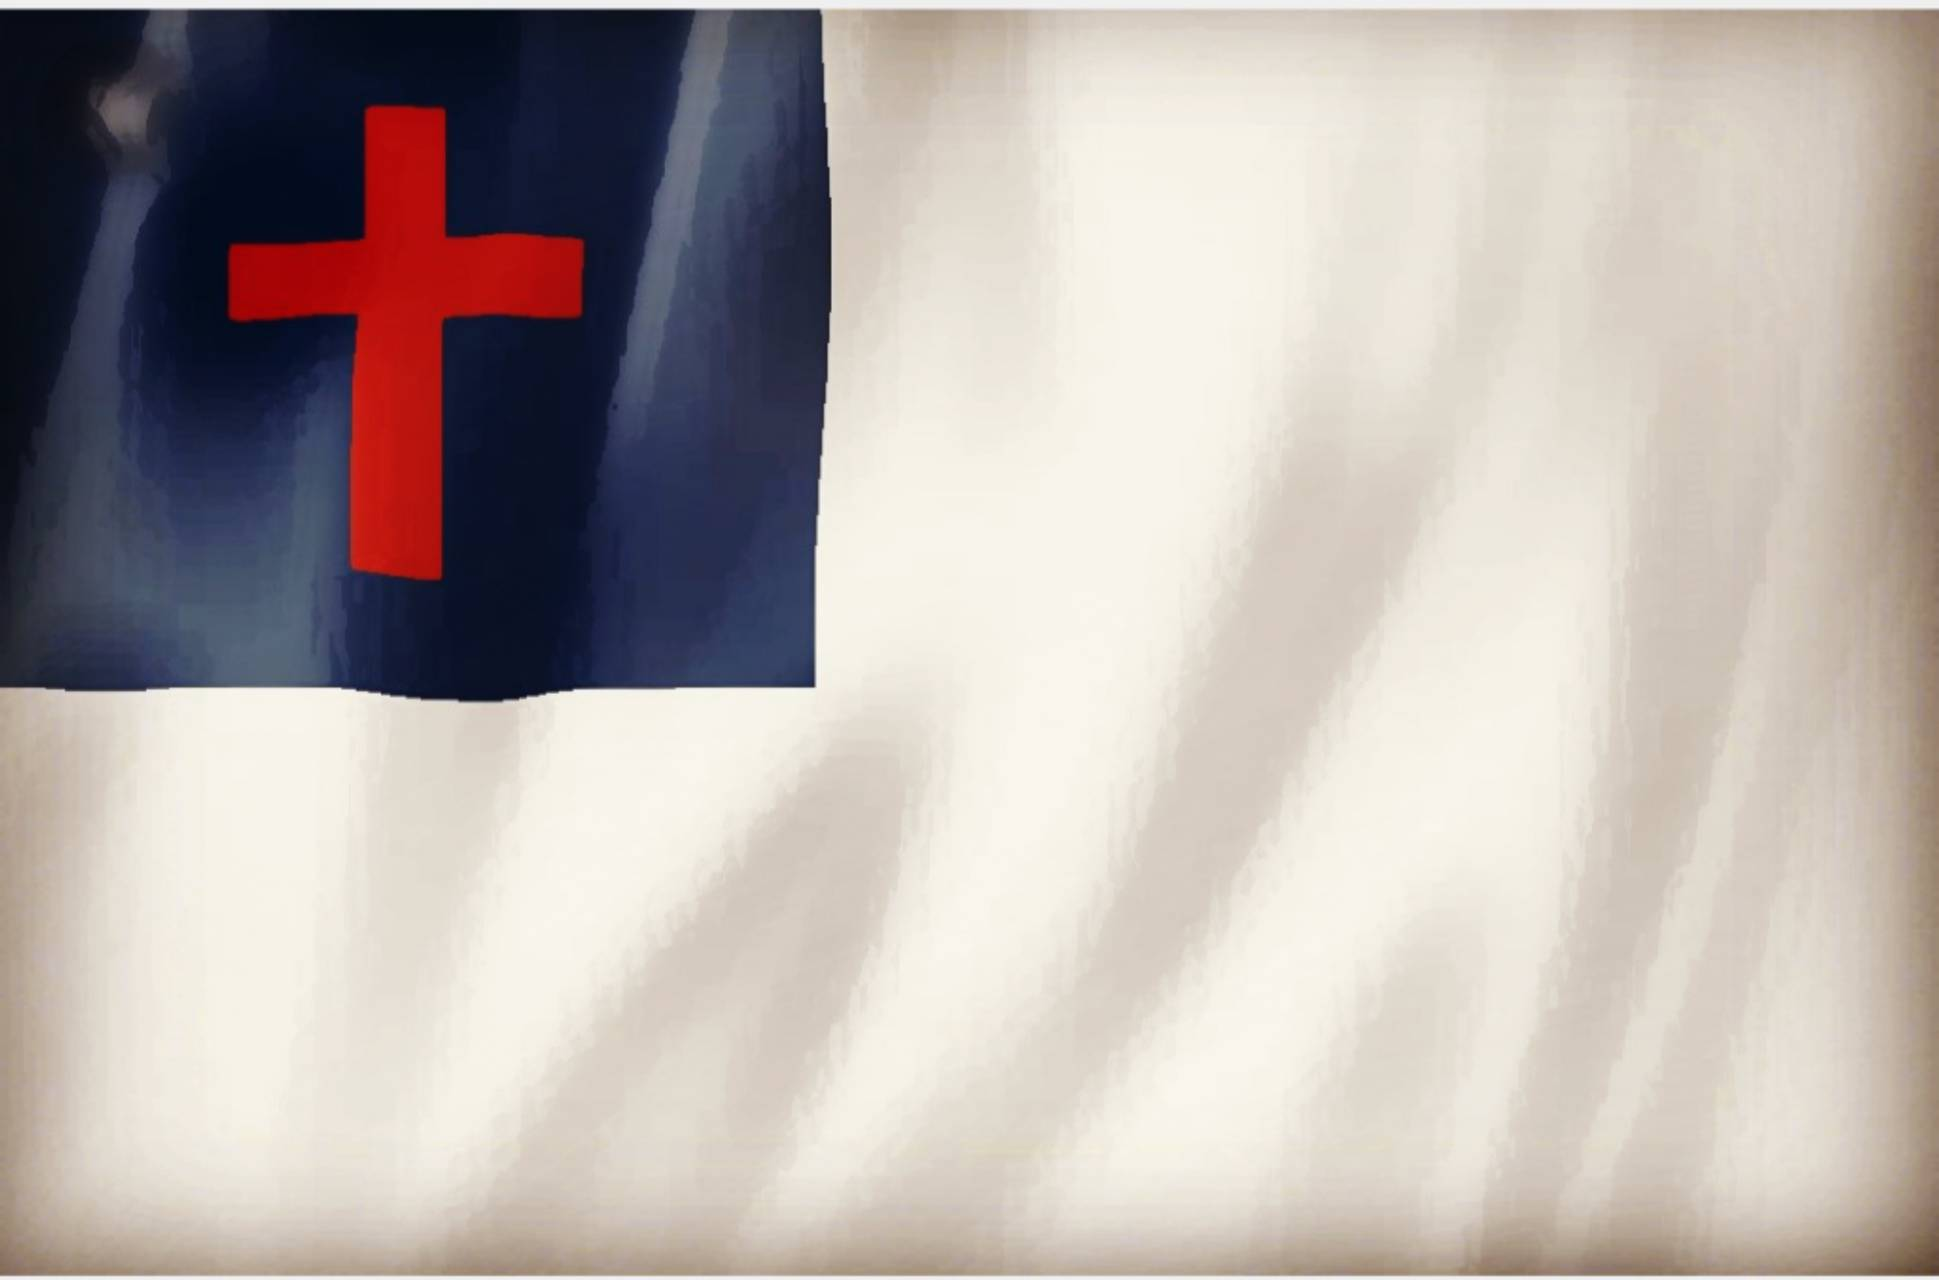 Christian Pride